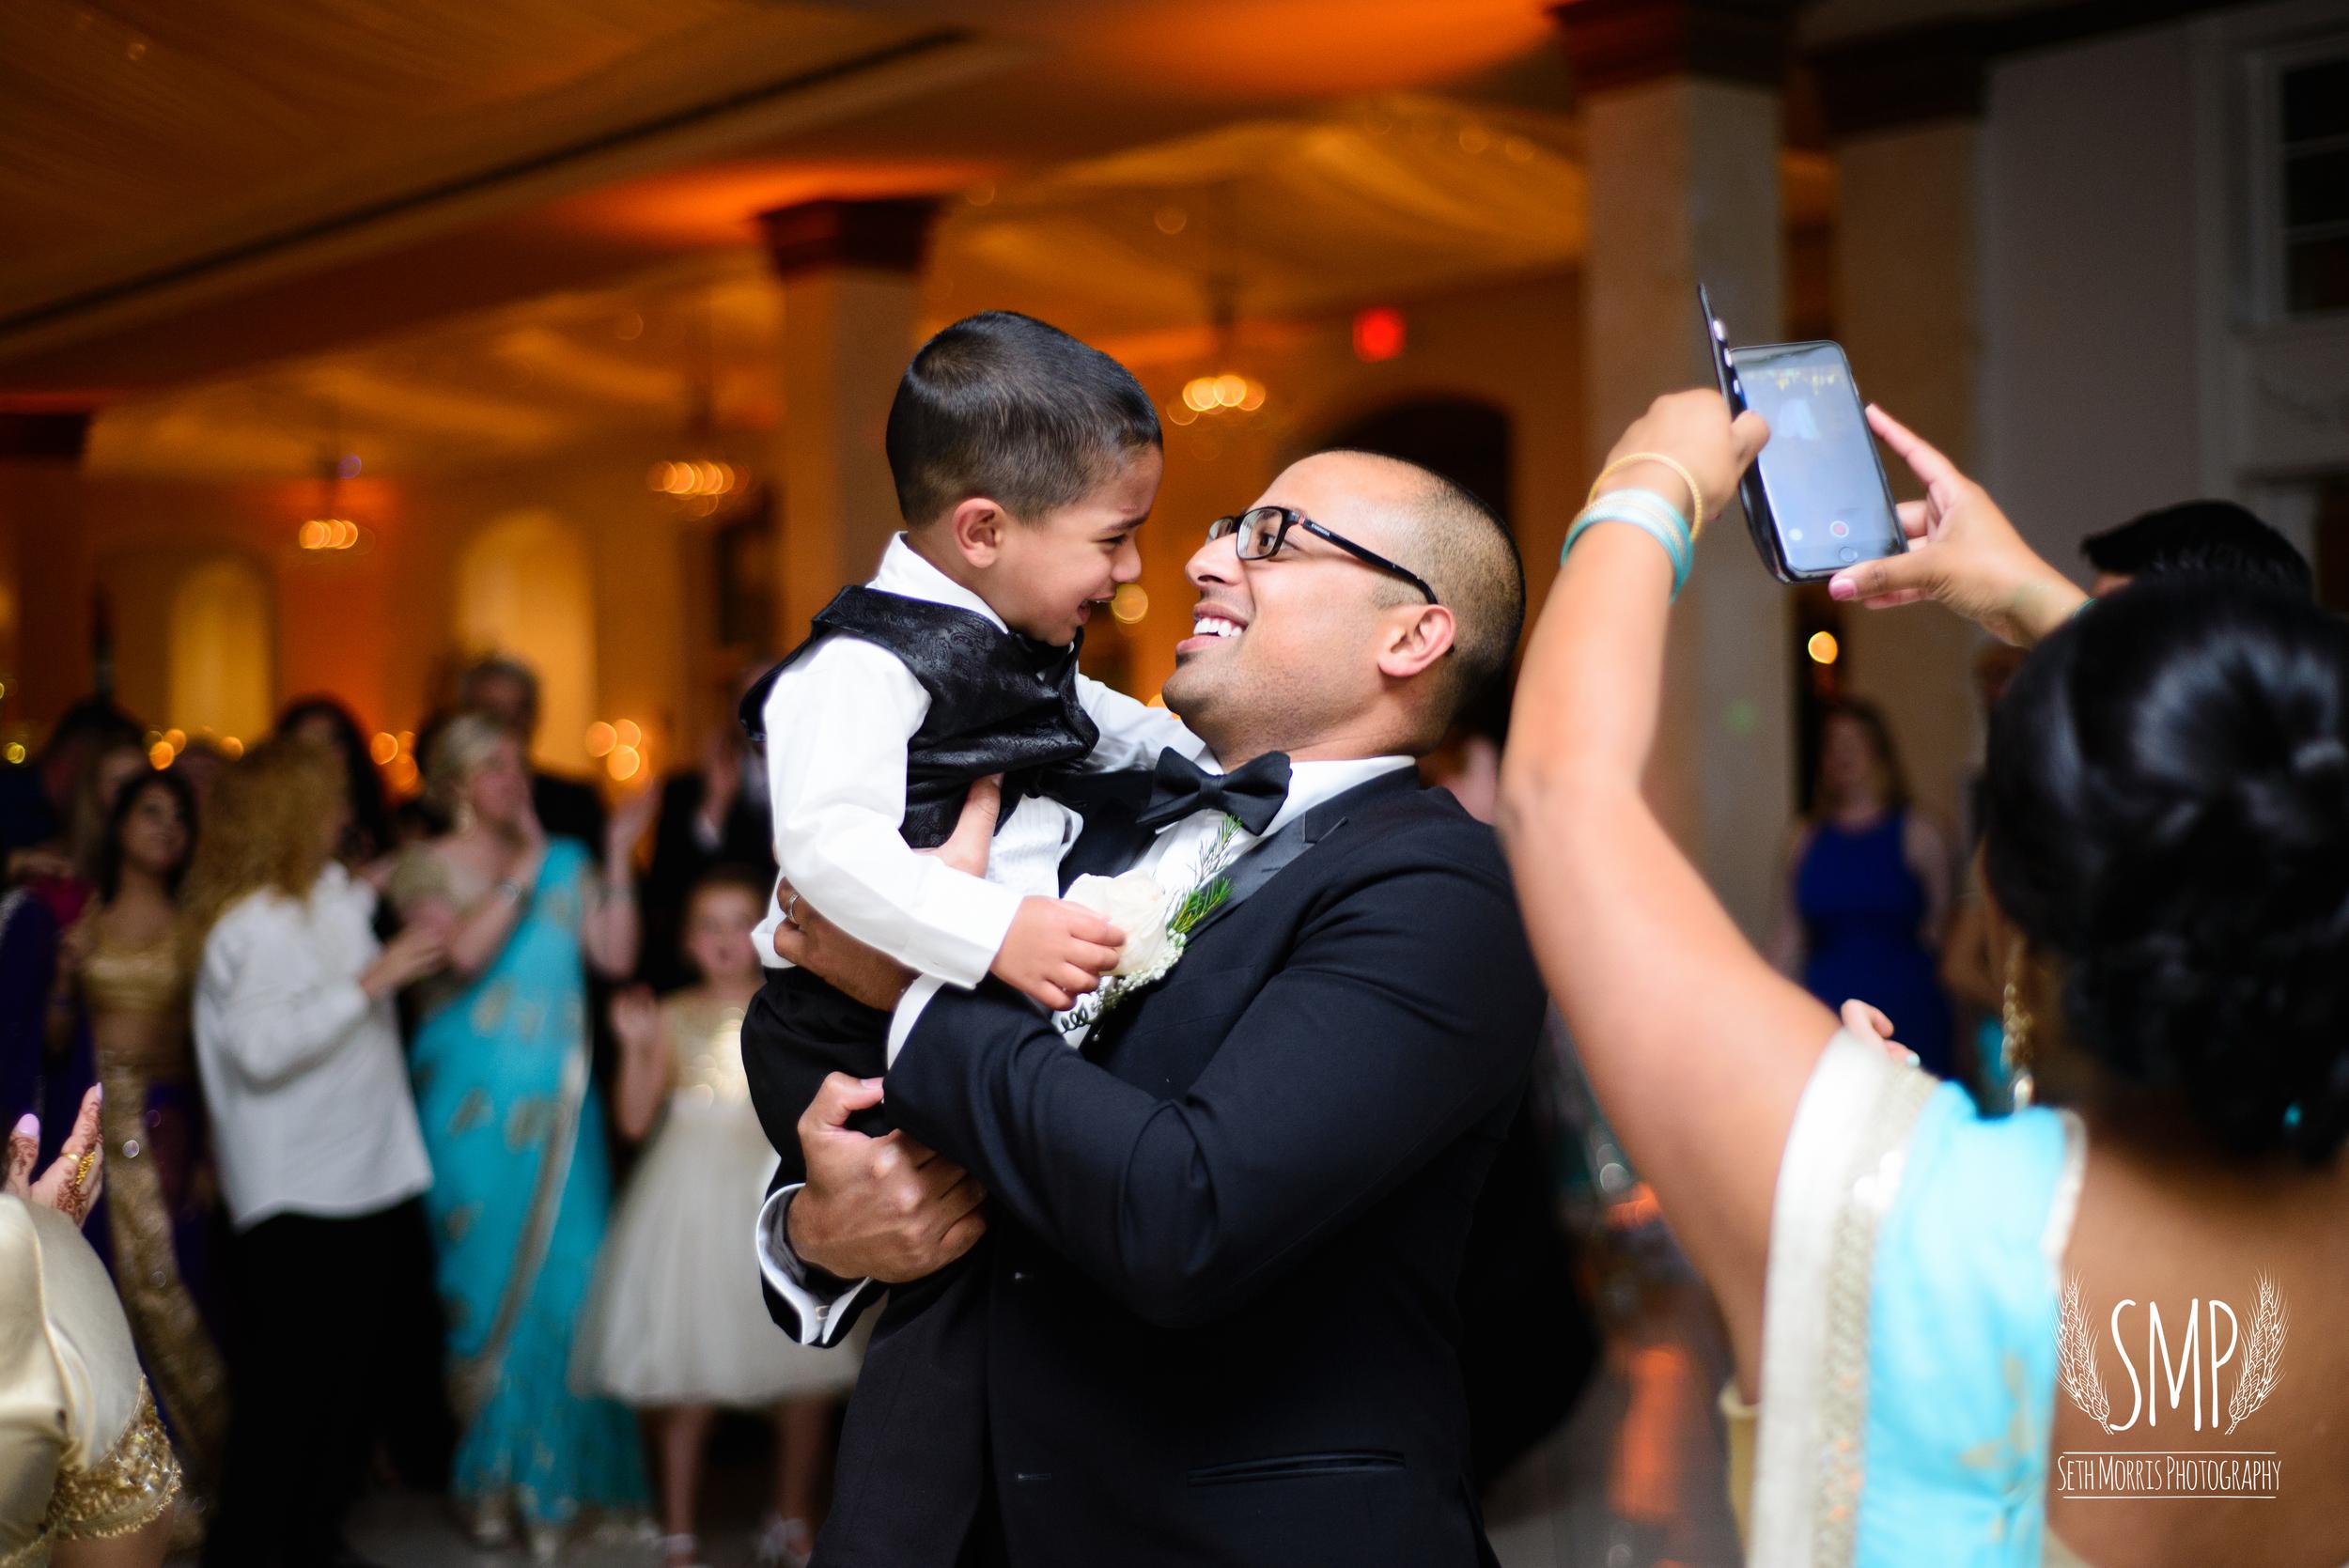 same-sex-wedding-photographer-chicago-illinois-114.jpg